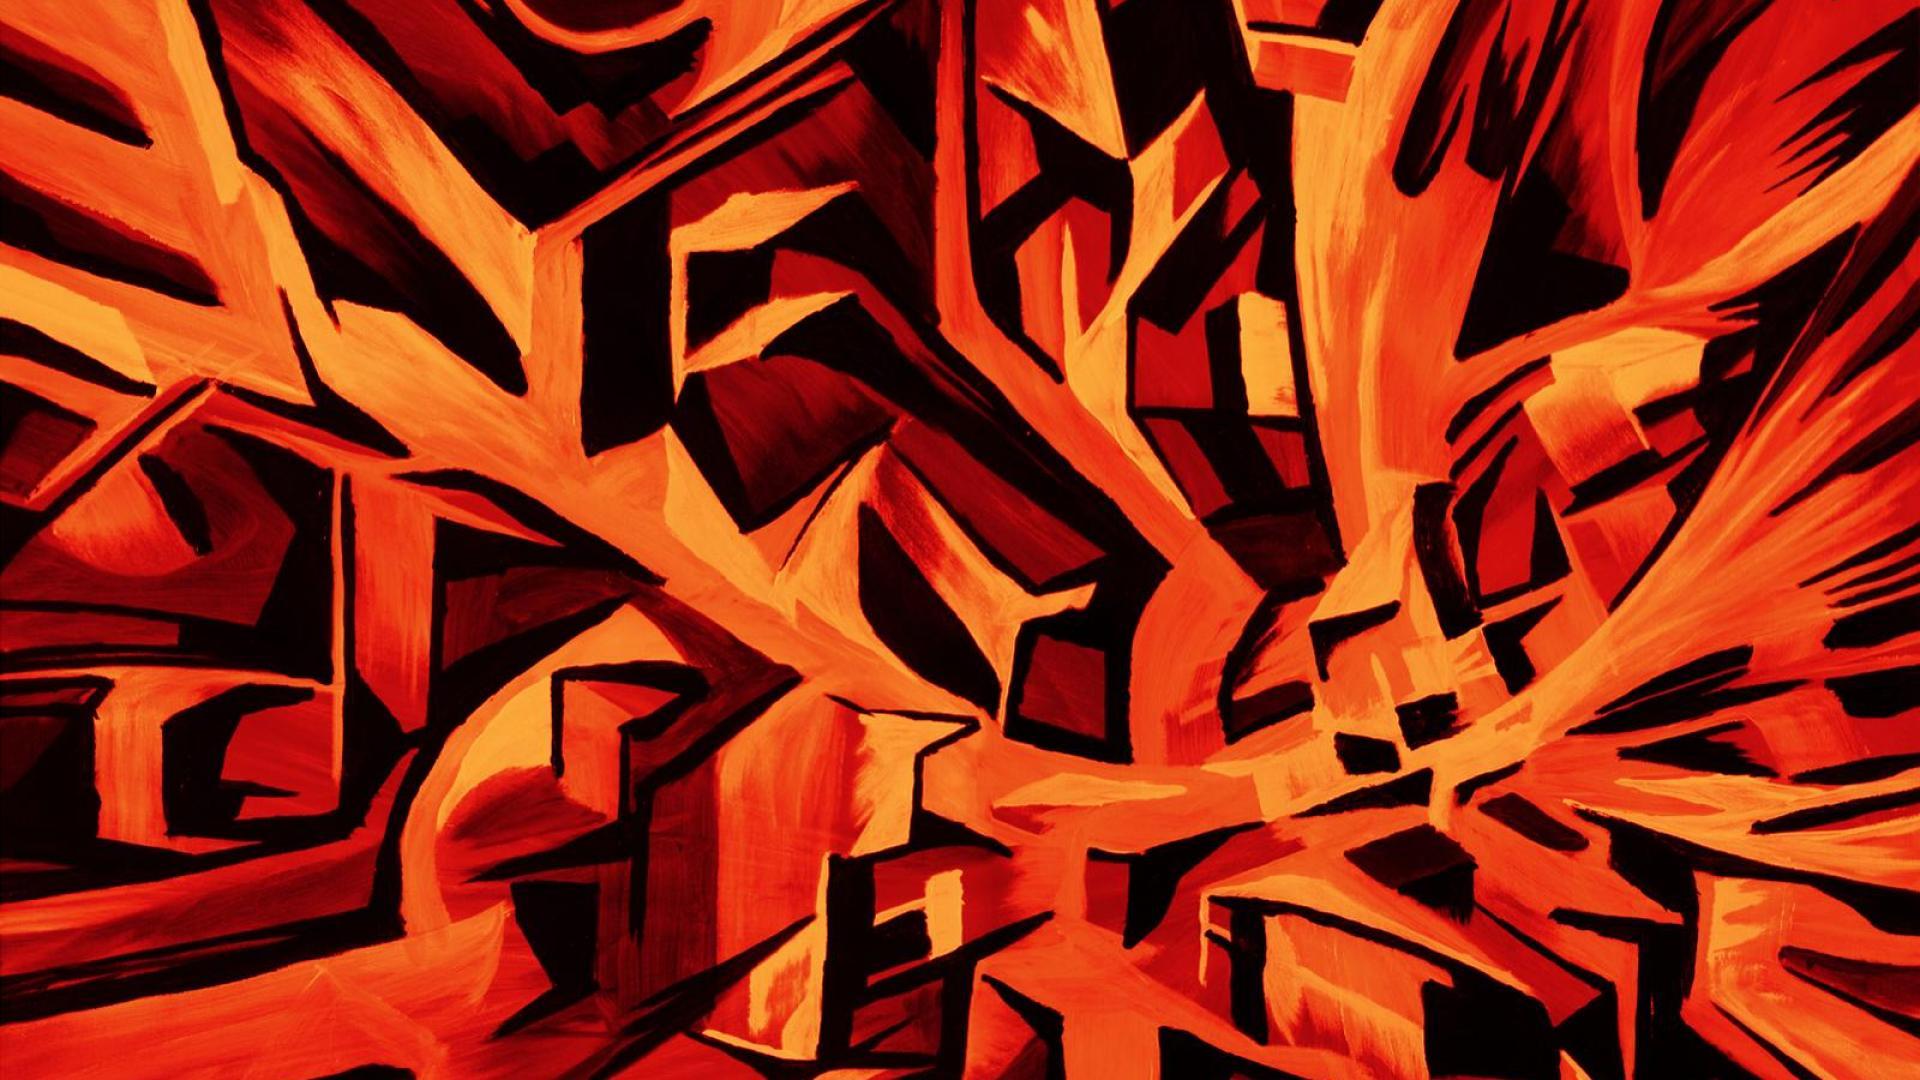 30 image for mobile black and orange black and orange wallpaper voltagebd Image collections